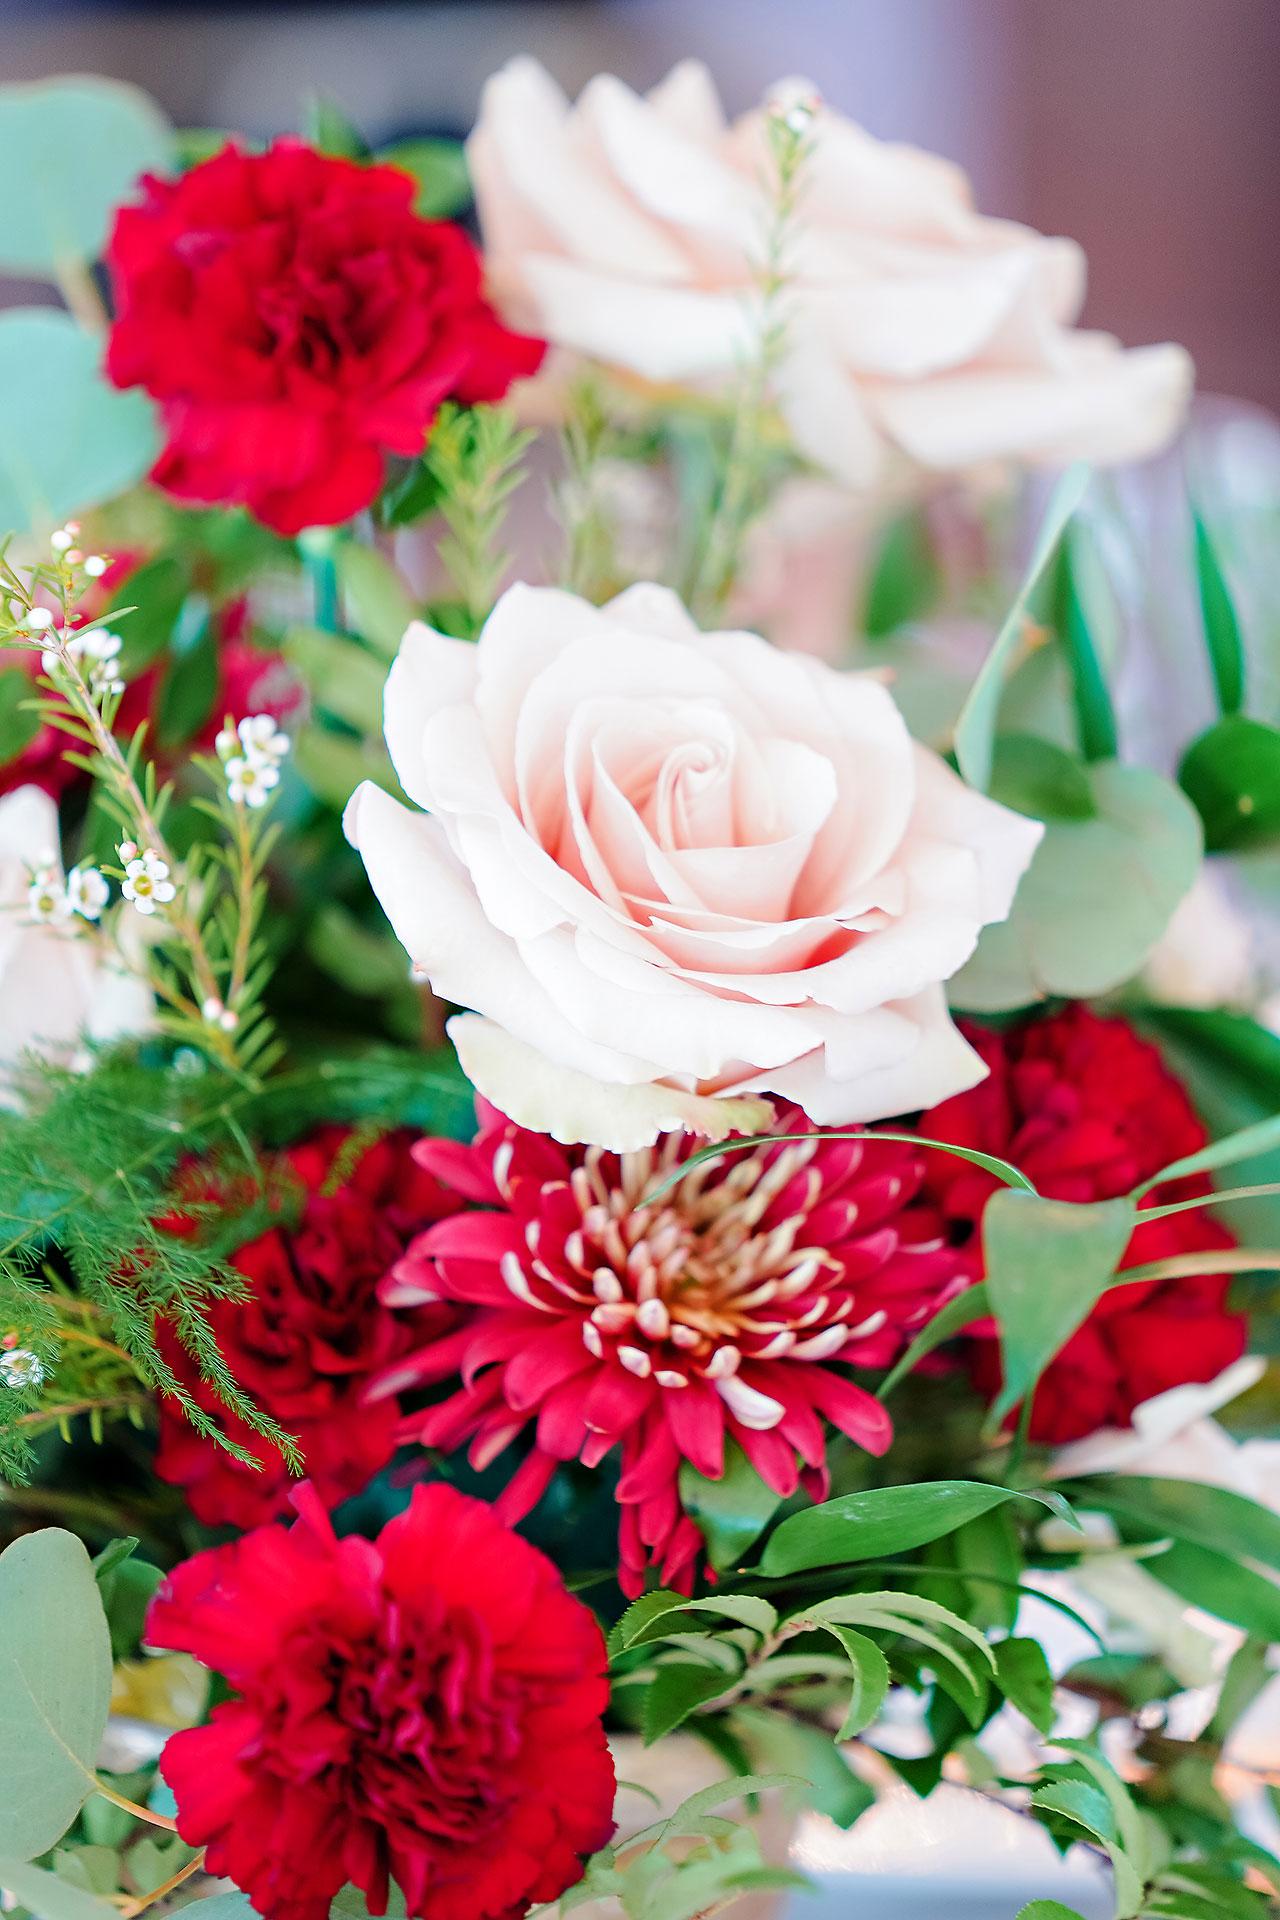 Nadia Parker Black Iris Estate Carmel Indiana Wedding May 2021 214